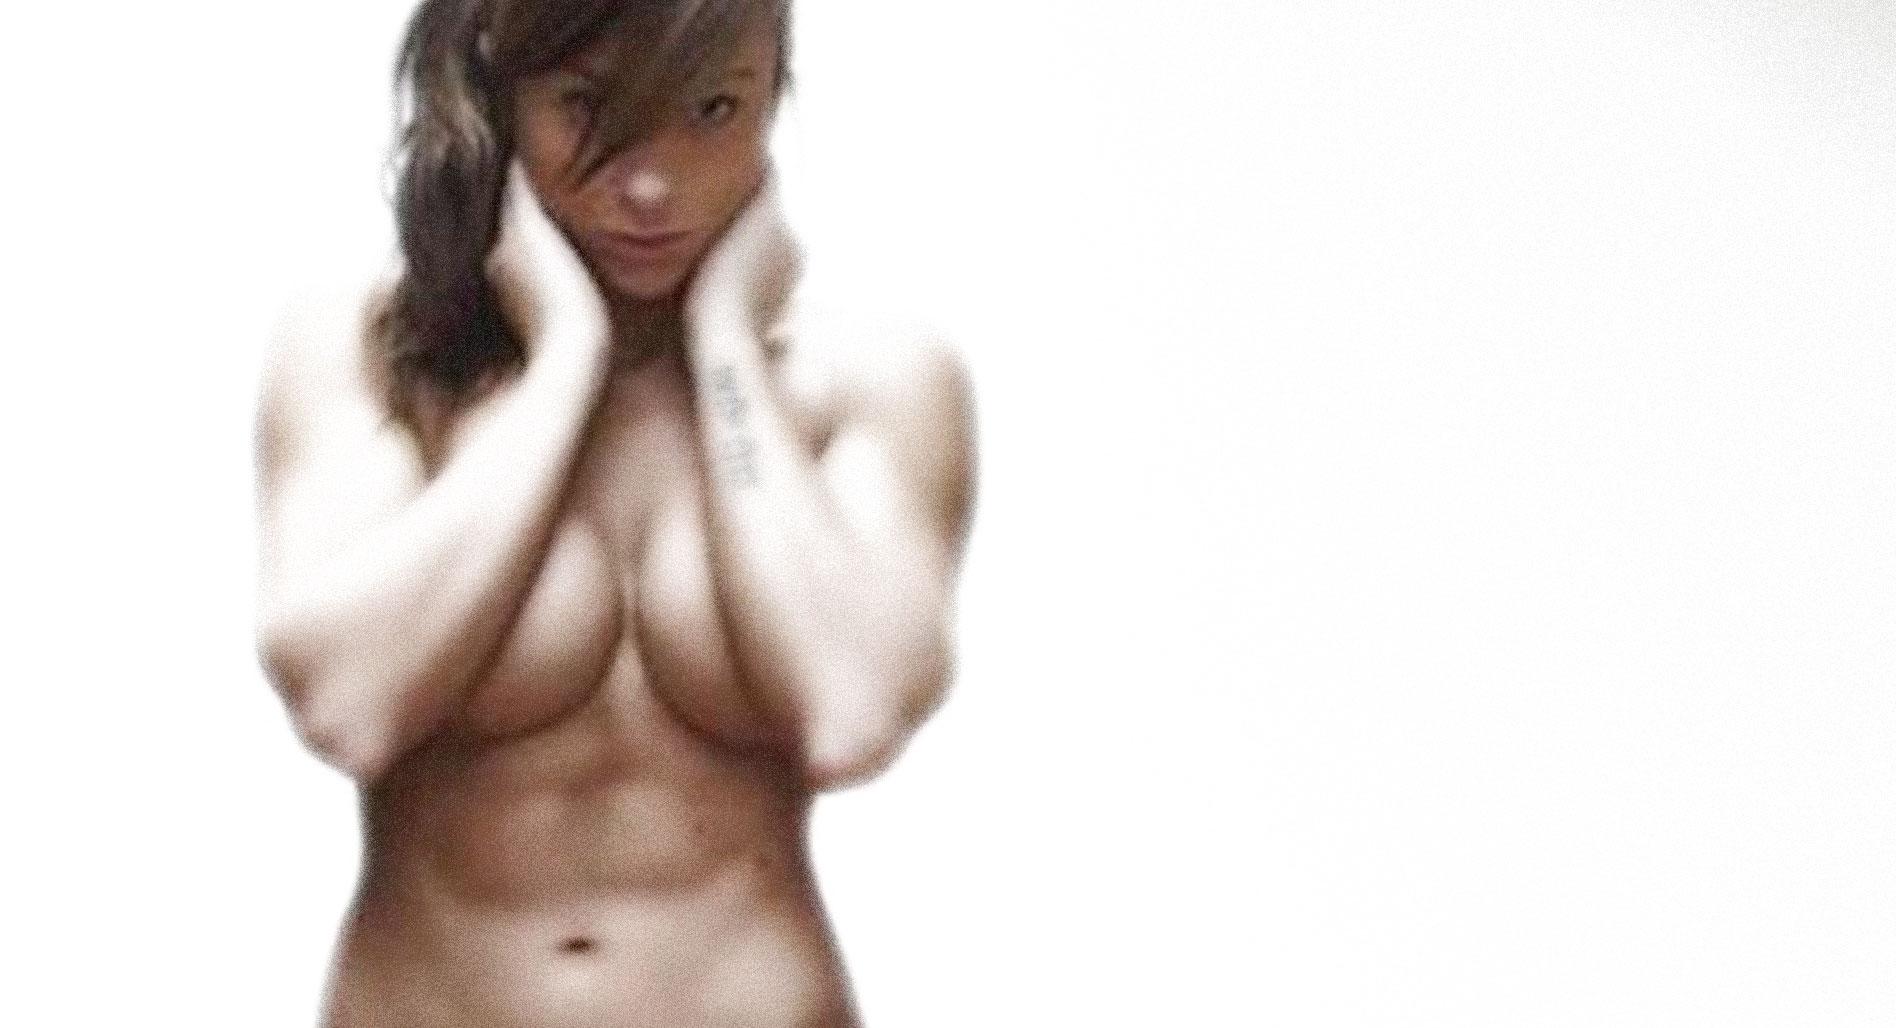 Top 20 Nude Fitness Photos